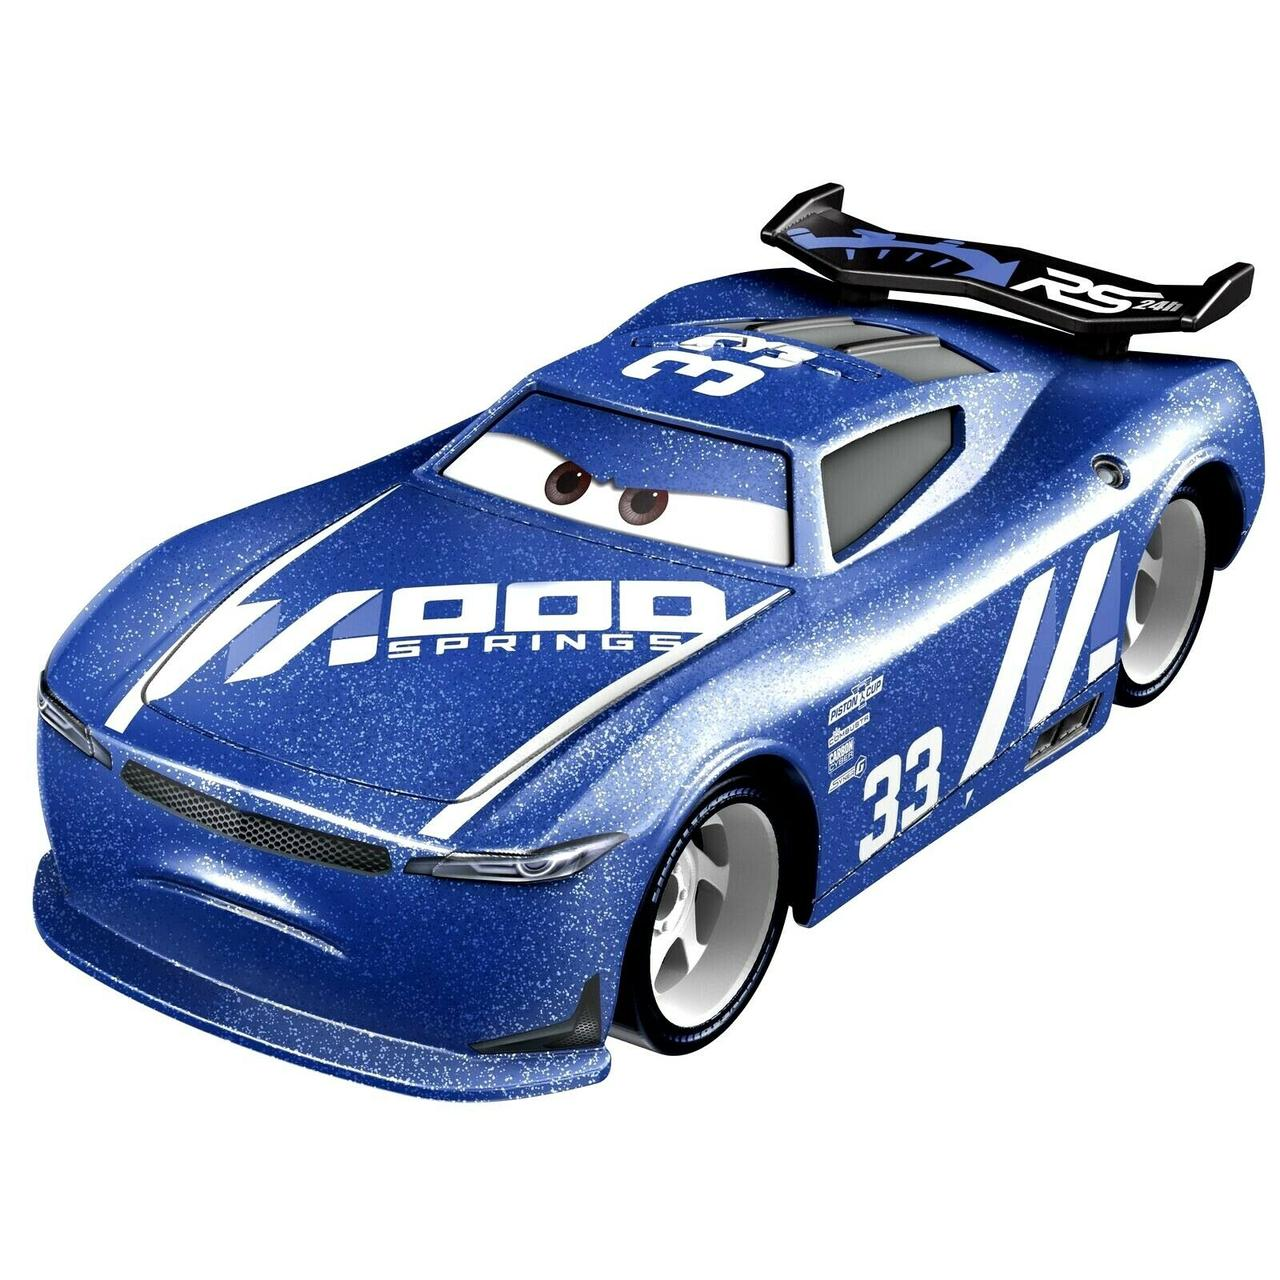 "Cars / Тачки ""Гонка на выносливость RS 24"" Эд Капото №33"